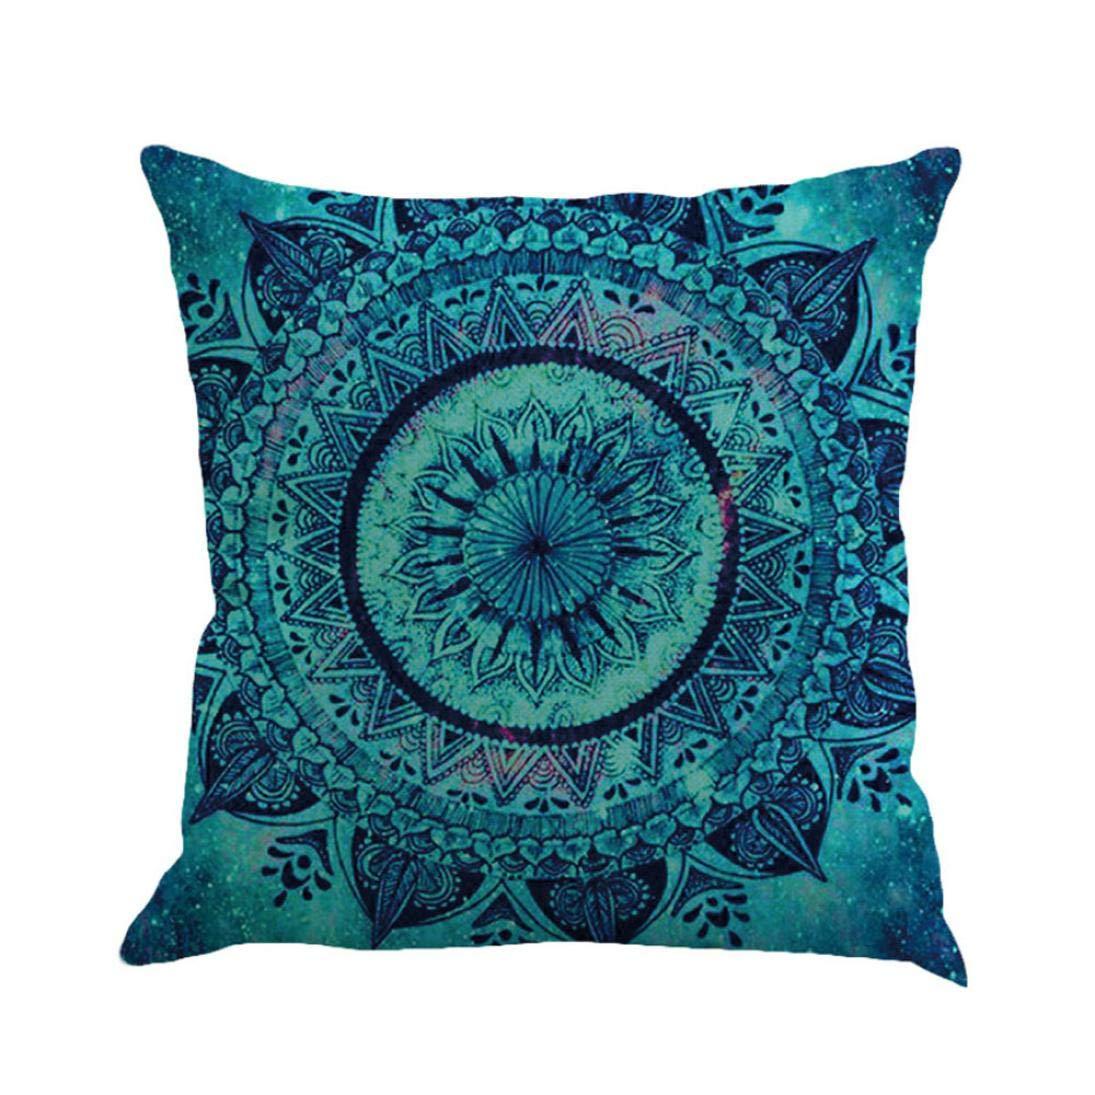 Alixyz Fashion Boho Print Patterns Pillow Cases Home Decor Pillow Case Linen Sofa Cushion Cover (A, M)